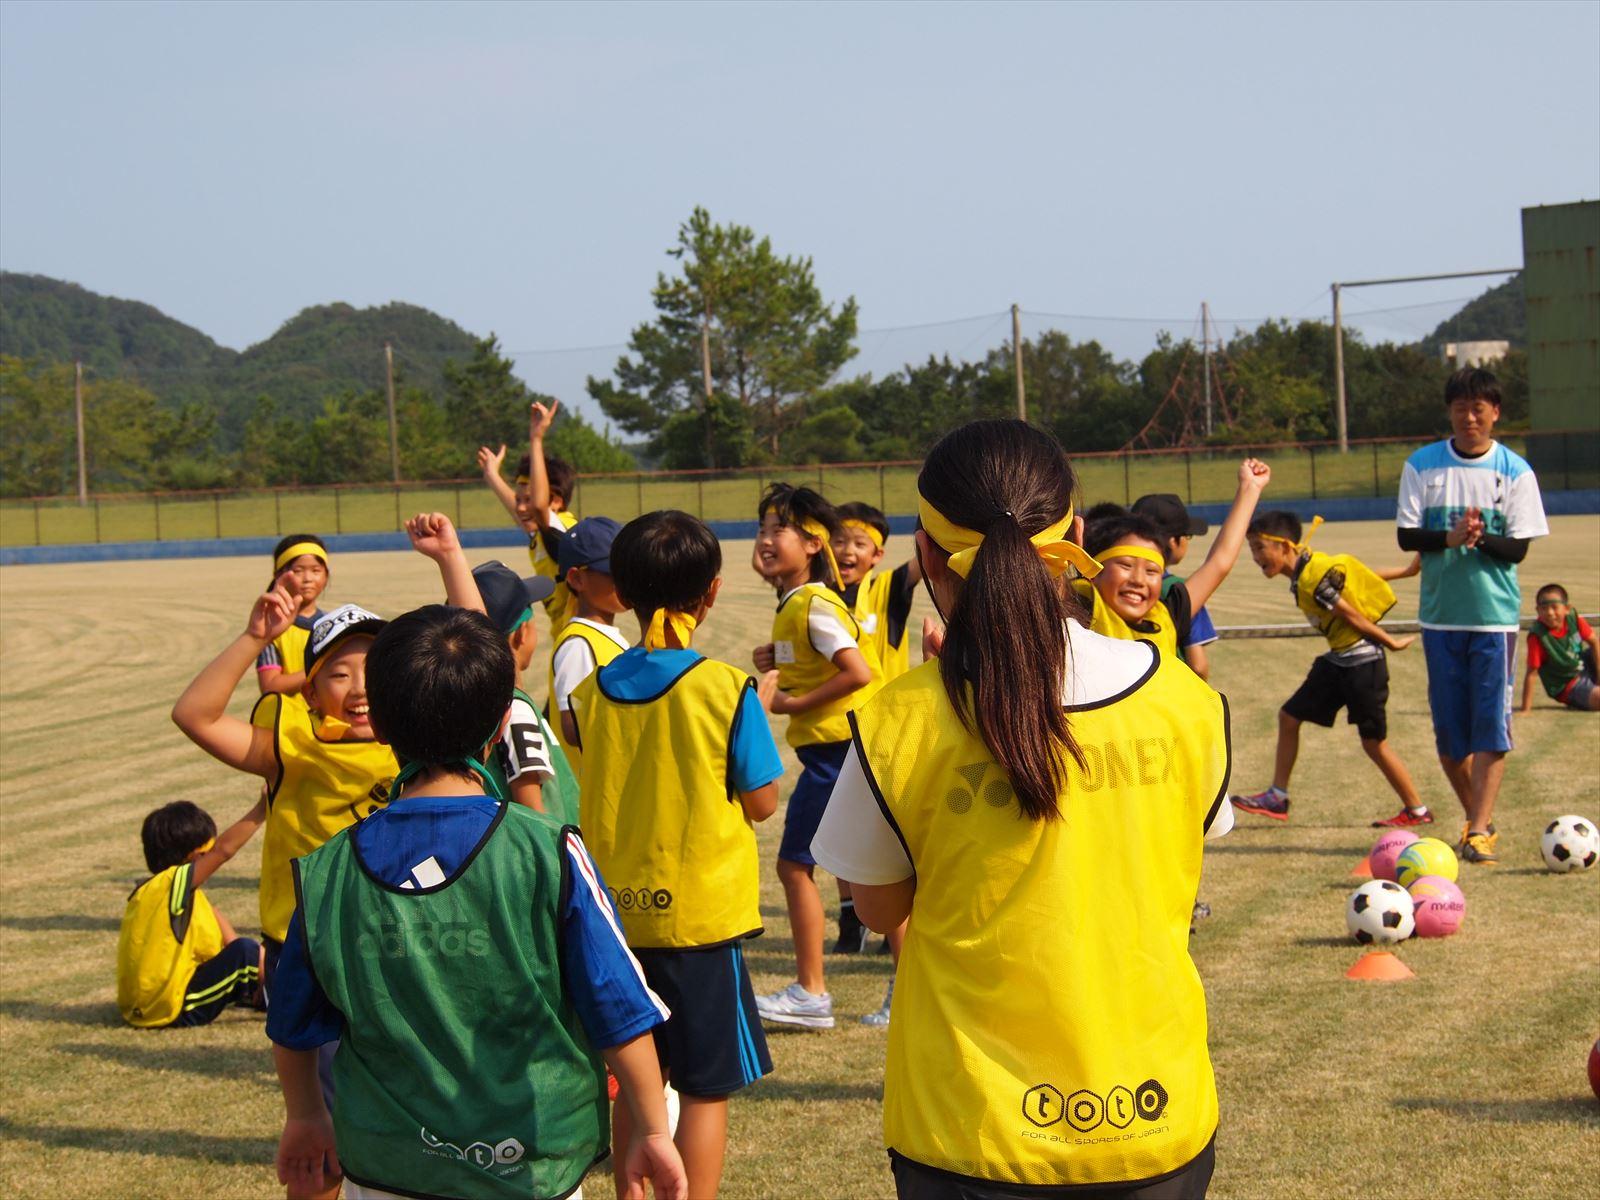 USFスポーツキャンプin徳島 USF代表理事 諸橋寛子 まぜのおか 小学生 ボランティア